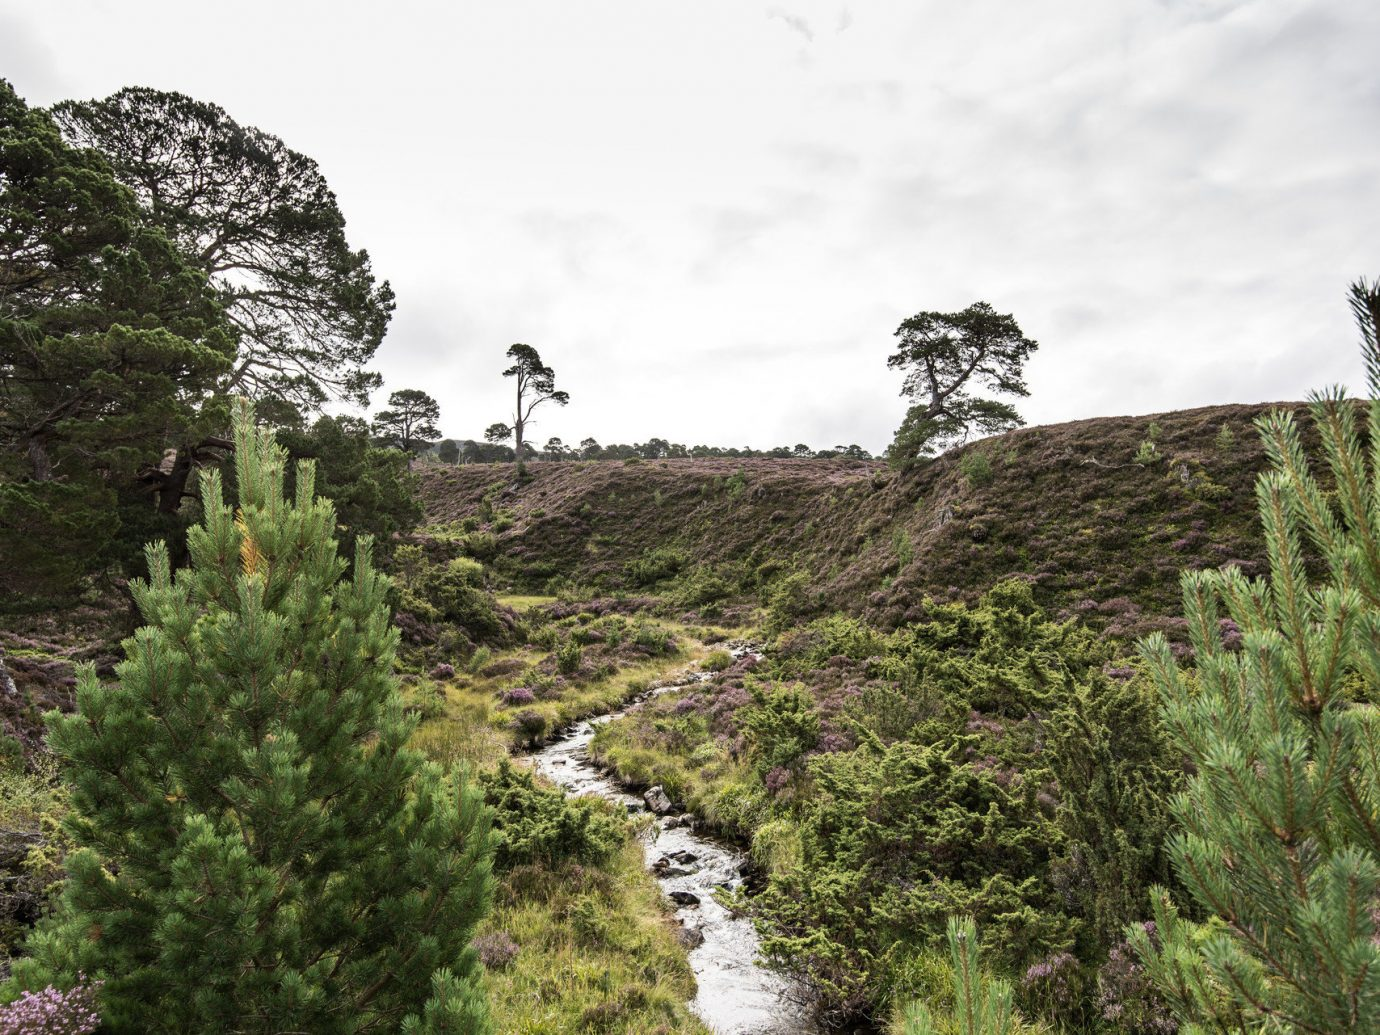 Hotels tree outdoor sky plant conifer ecosystem rock mountain hill landscape cliff terrain flower valley hillside lush